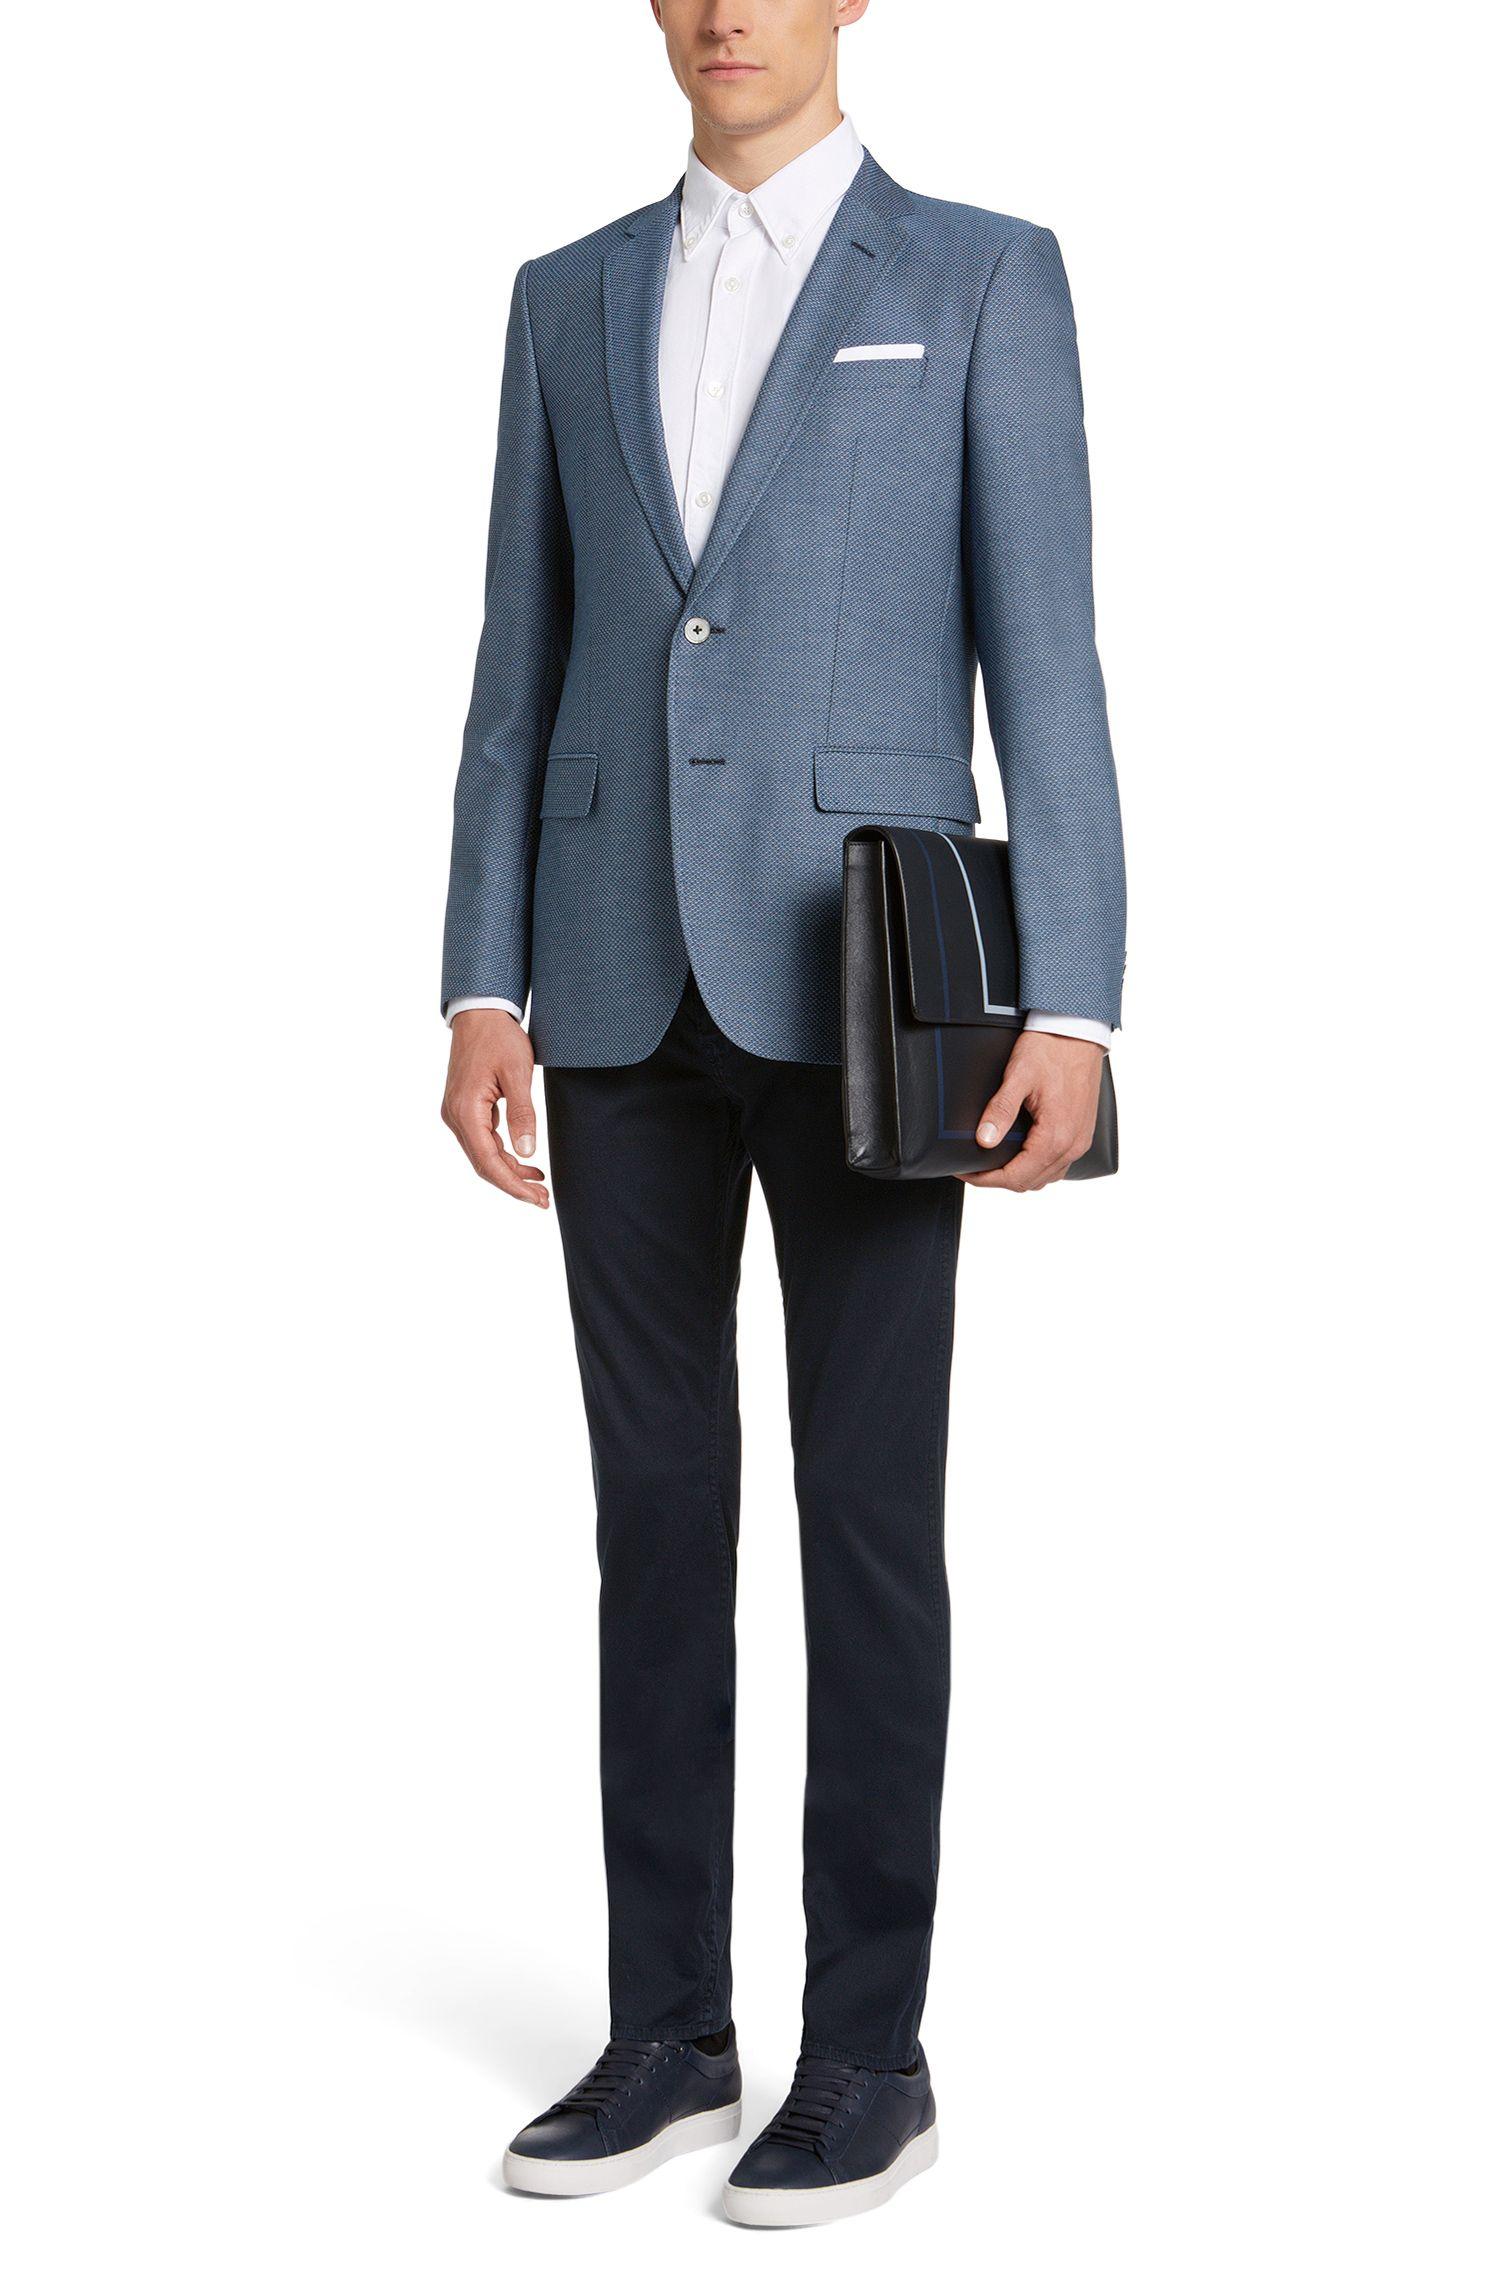 Unifarbene Slim-Fit Jeans aus Stretch-Baumwolle: 'Delaware3-20'